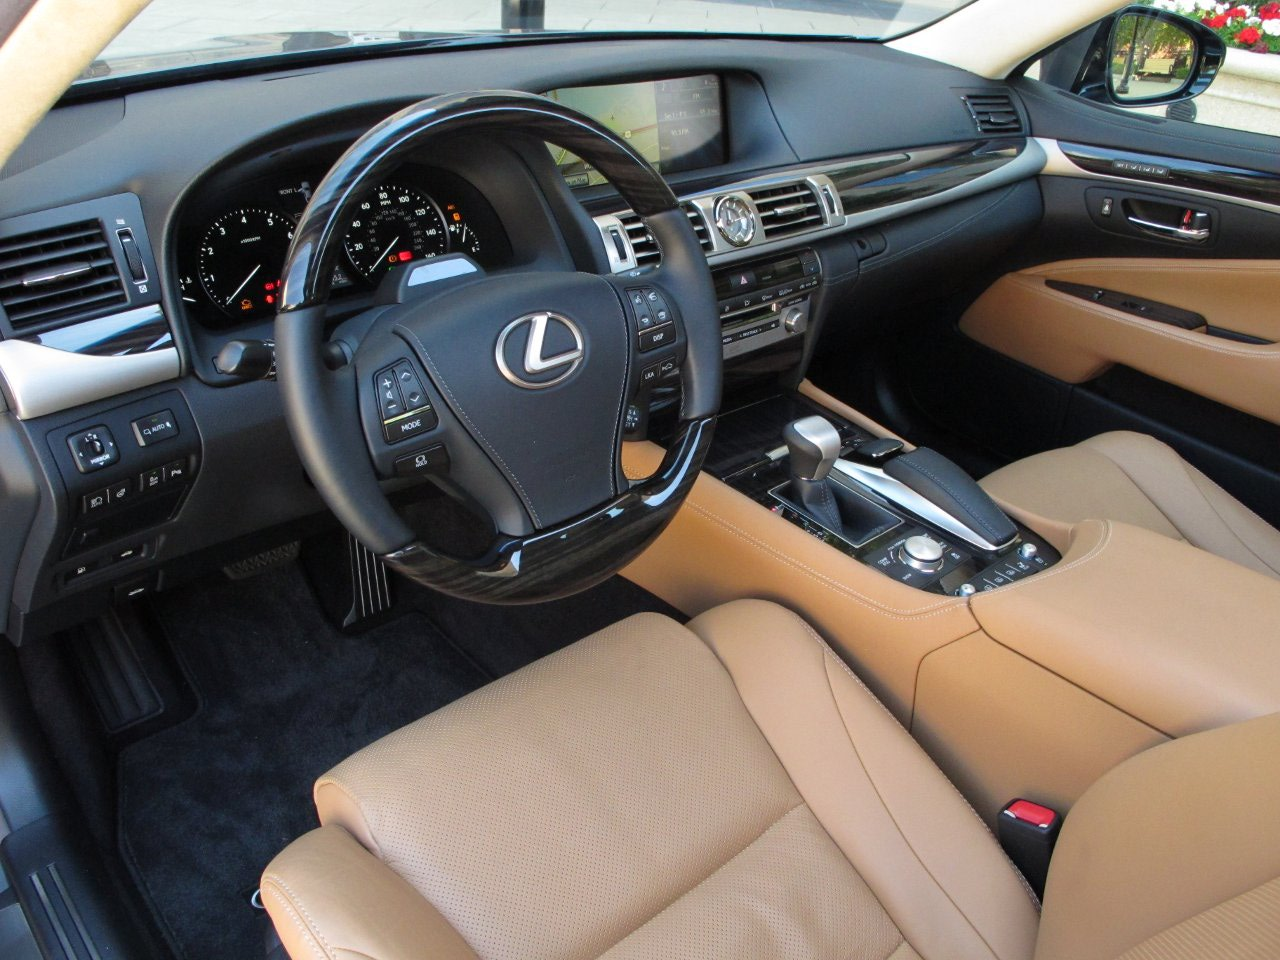 http://gearandgrit.com/wp-content/uploads/2013/03/2013-lexus-ls-460-review-behind-the-wheel-ziprage-8.jpg